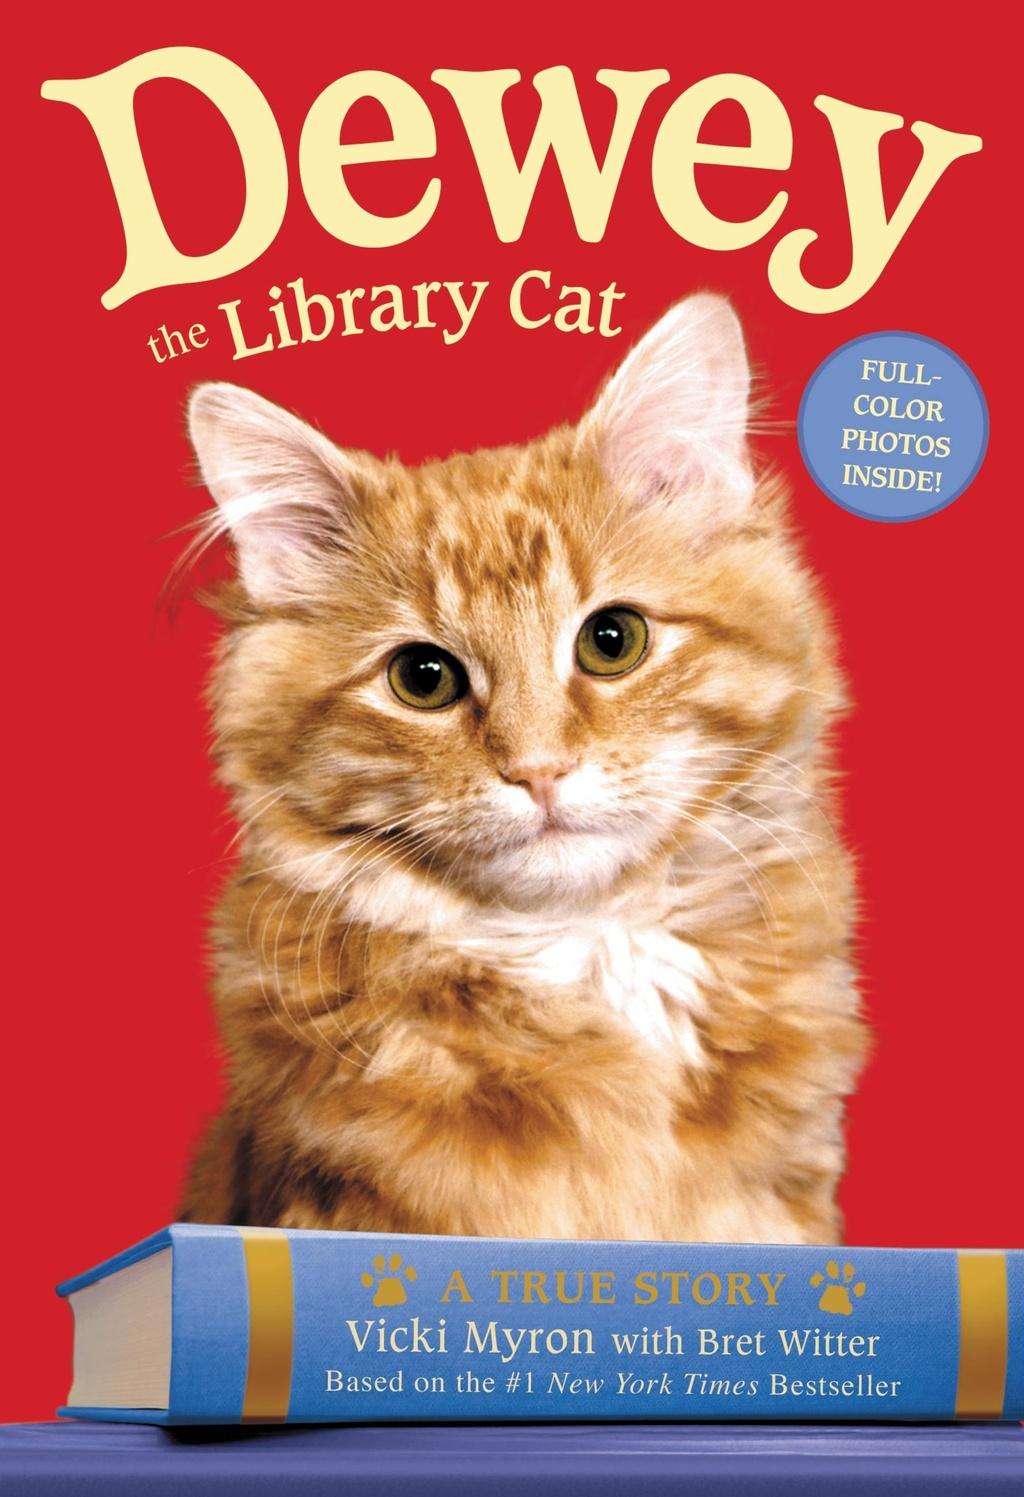 dewey the library cat.jpg